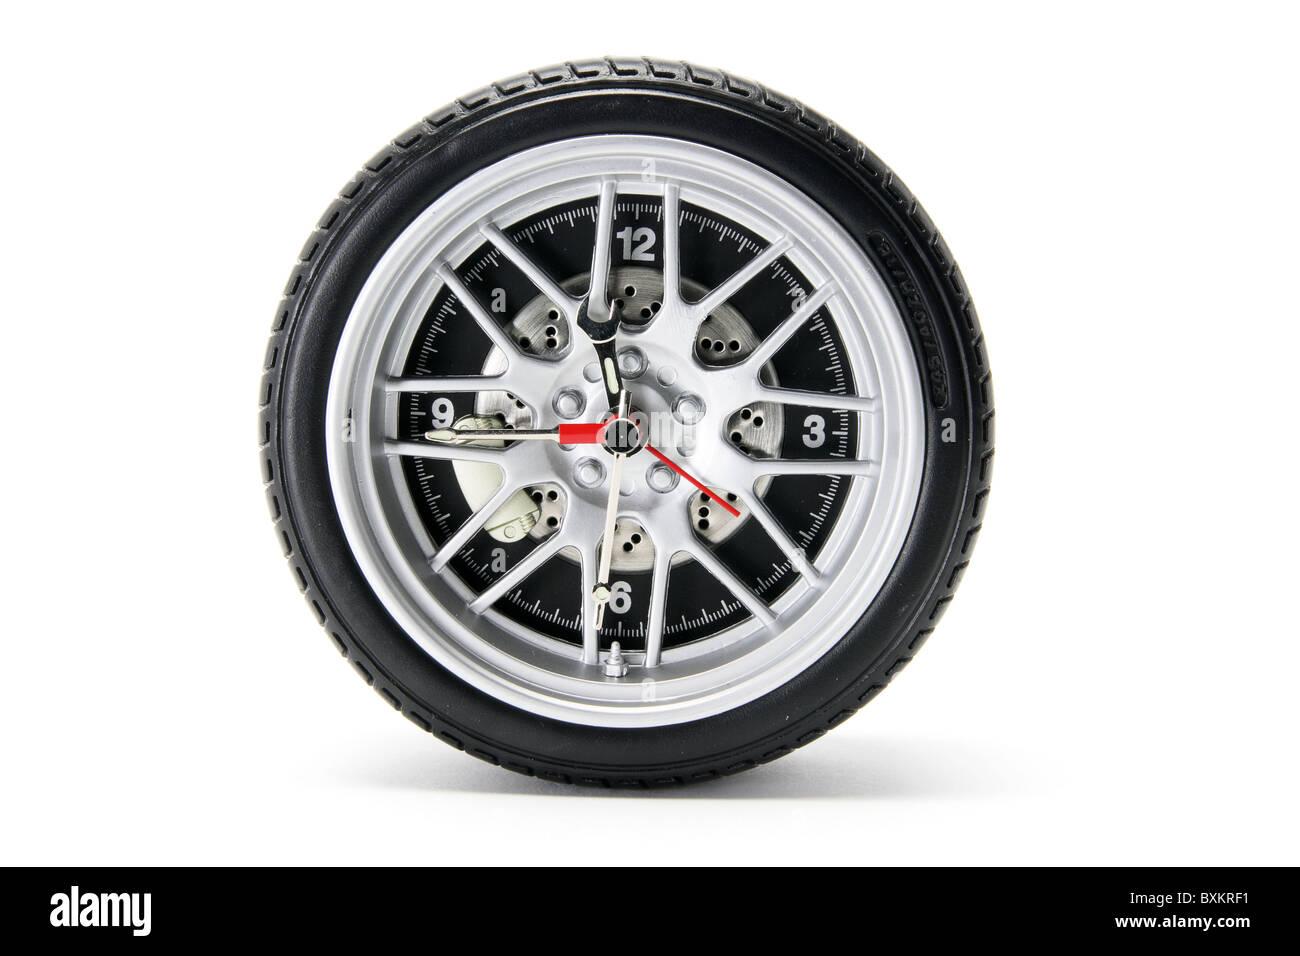 Horloge pneu Photo Stock